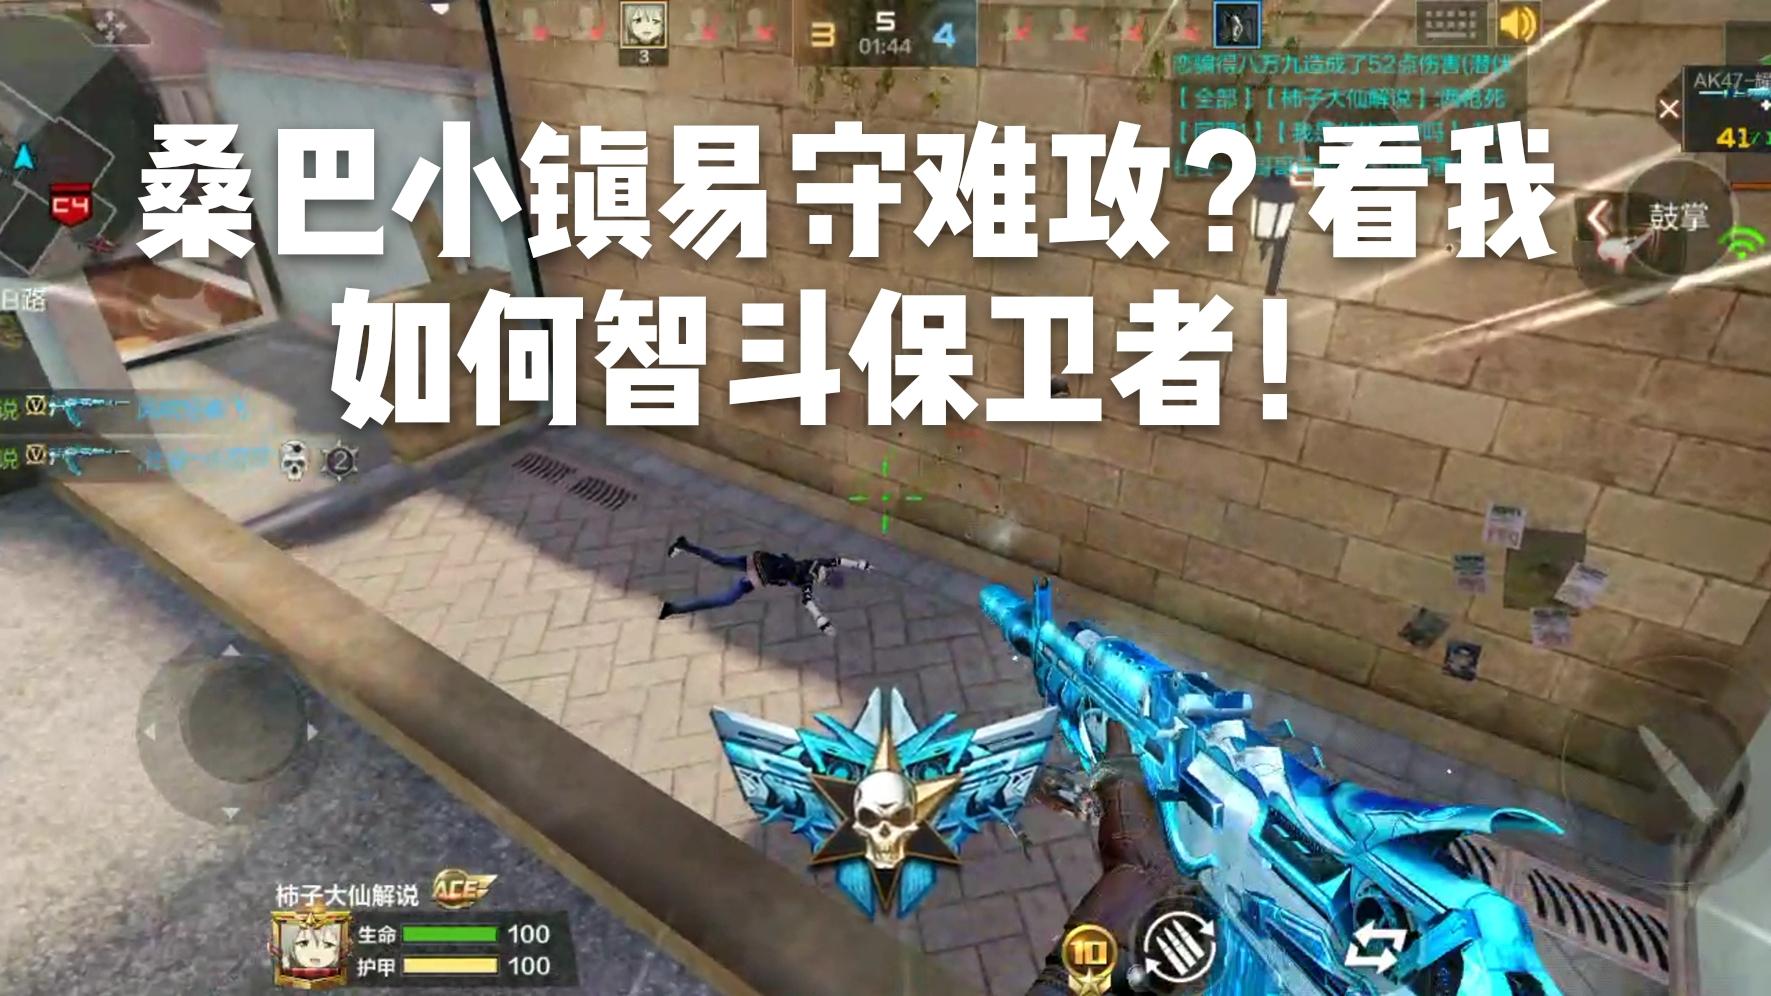 CF手游柿子:桑巴小镇易守难攻?看我如何智斗保卫者!